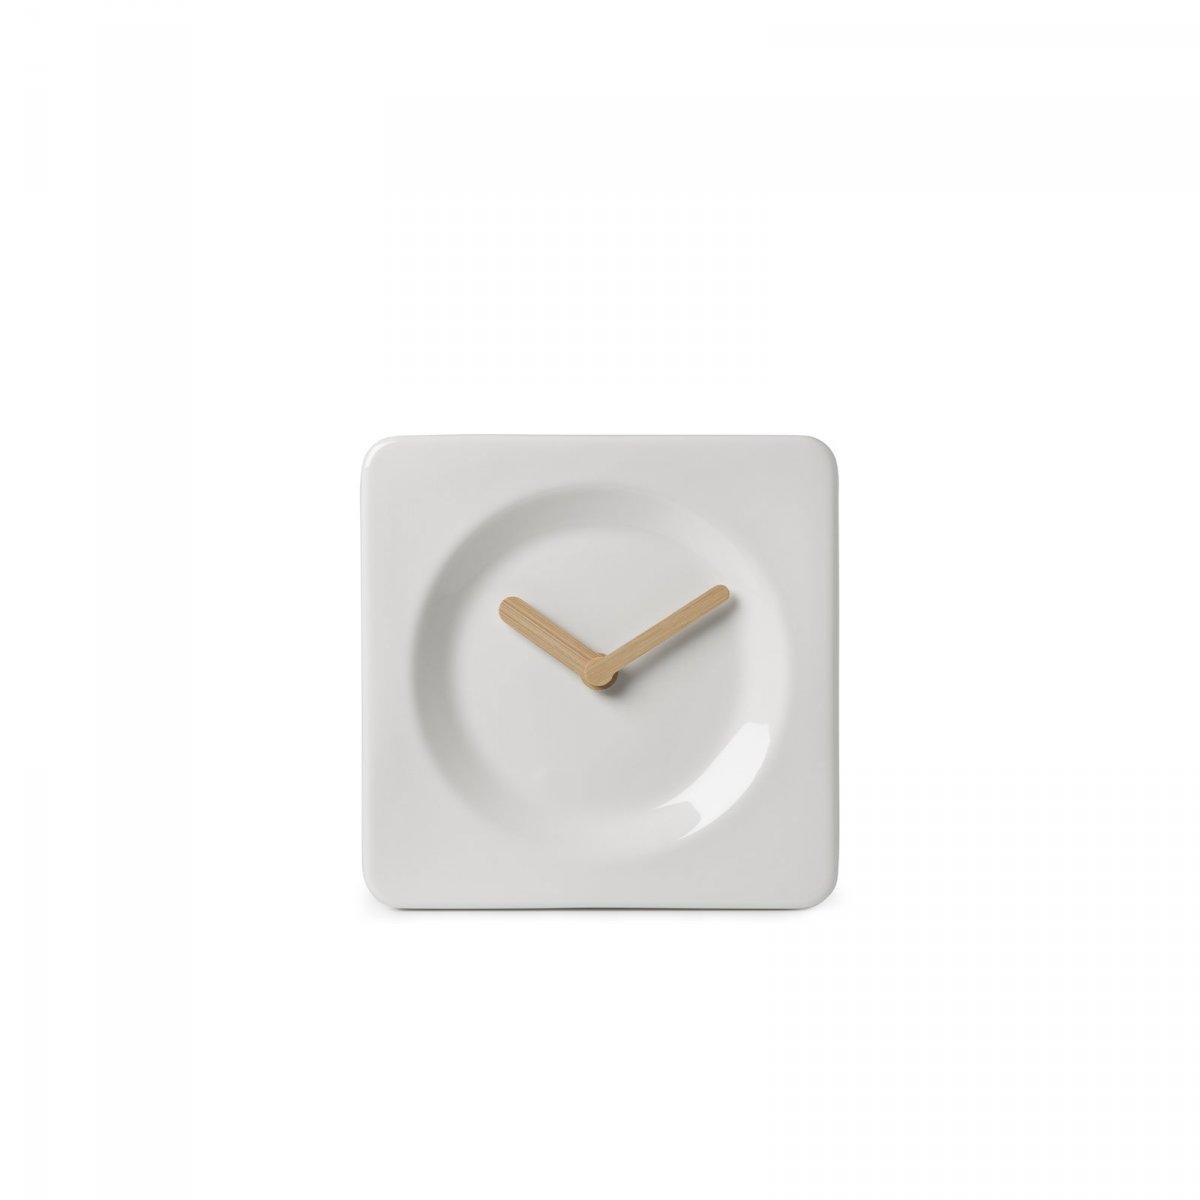 Tile desk/wall clock.